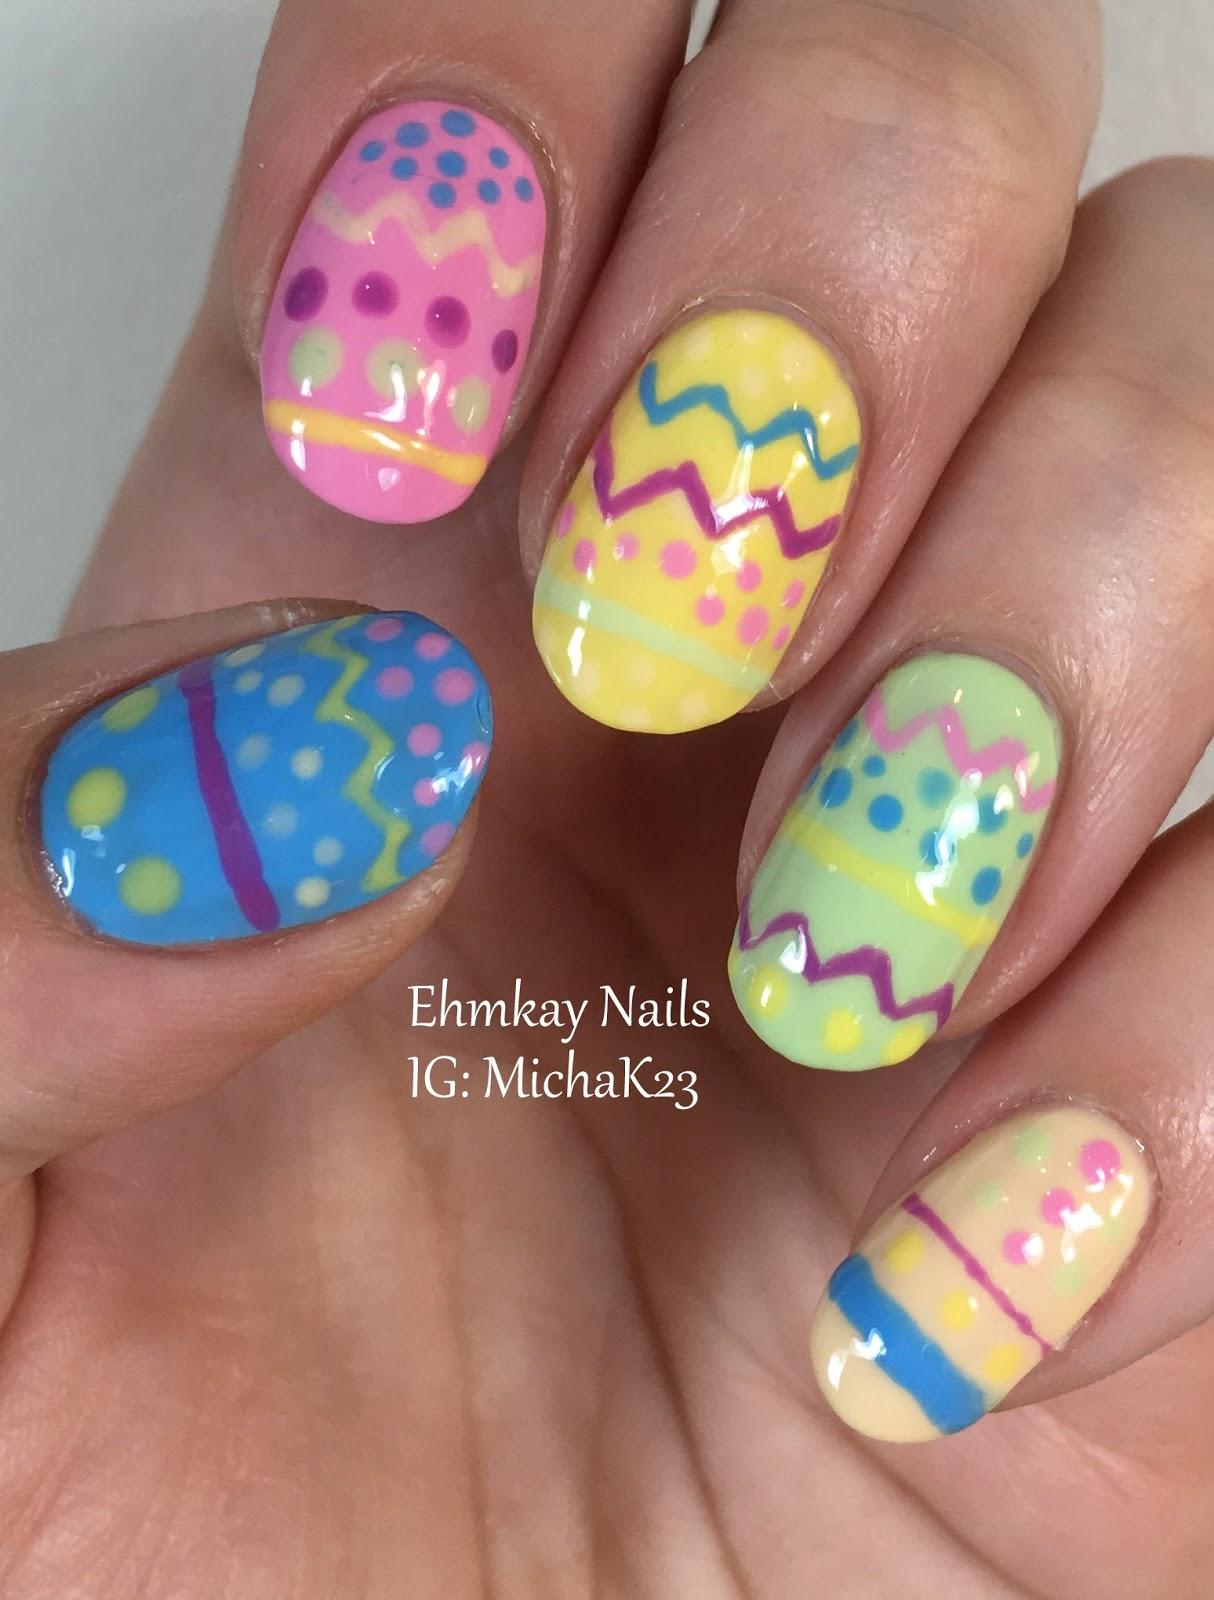 ehmkay nails: Easter Nail Art: Easter Eggs Nail Art with Paint Box ...